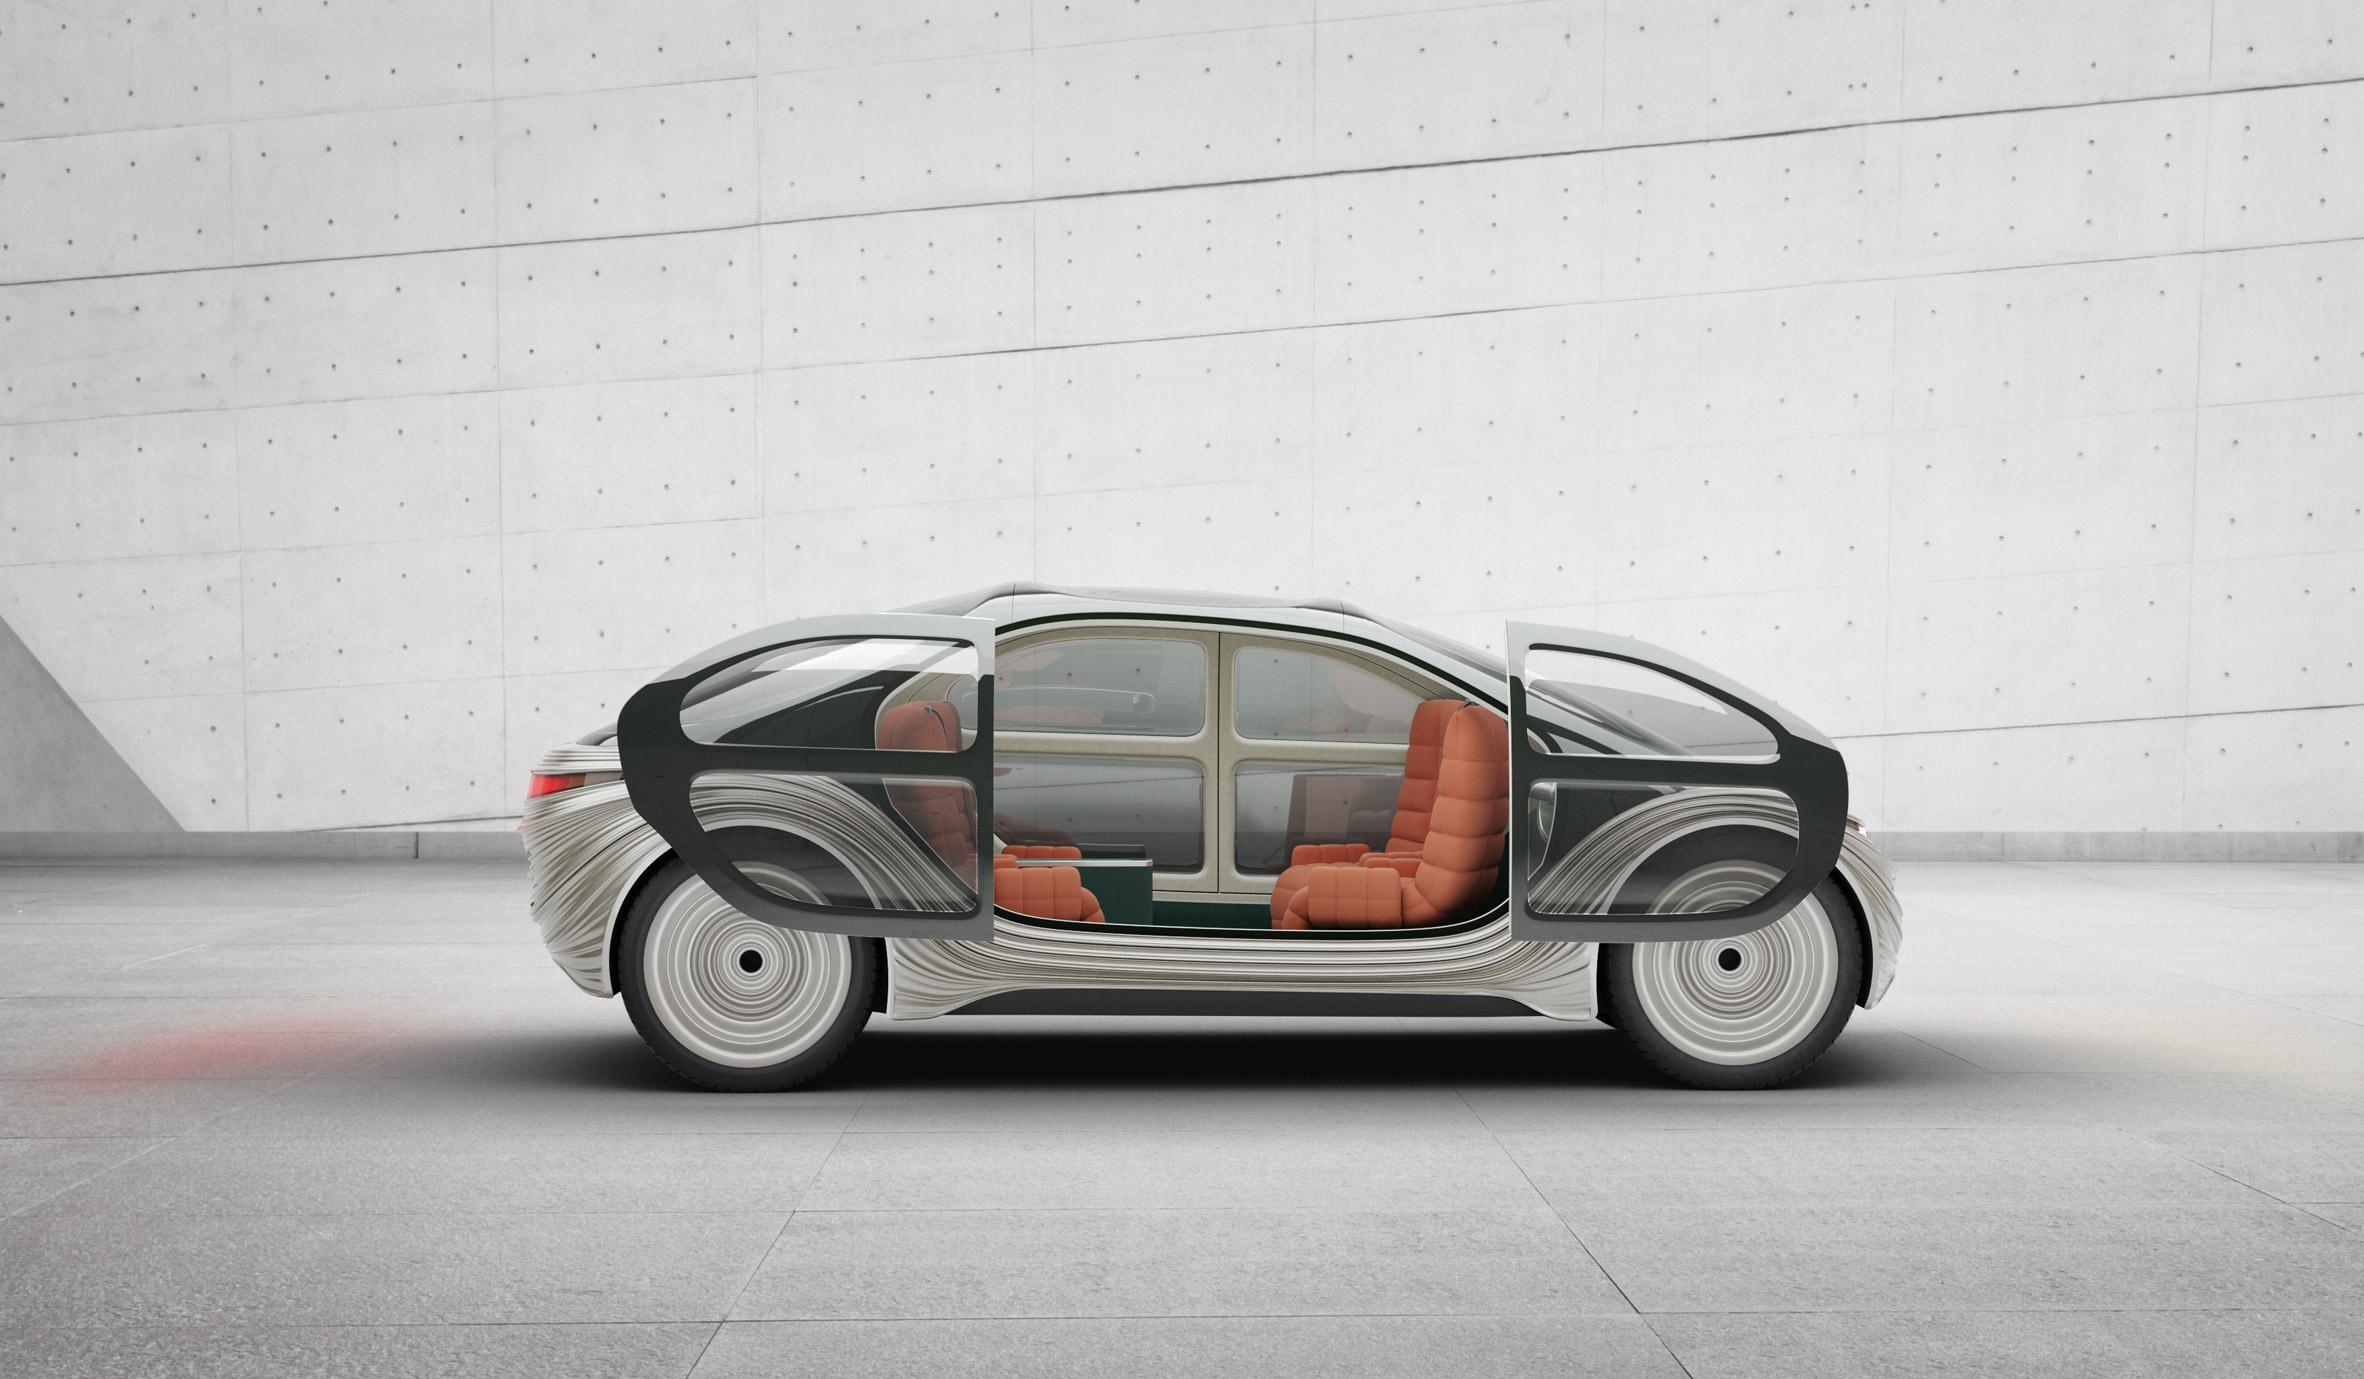 Sliding doors on Airo electric car